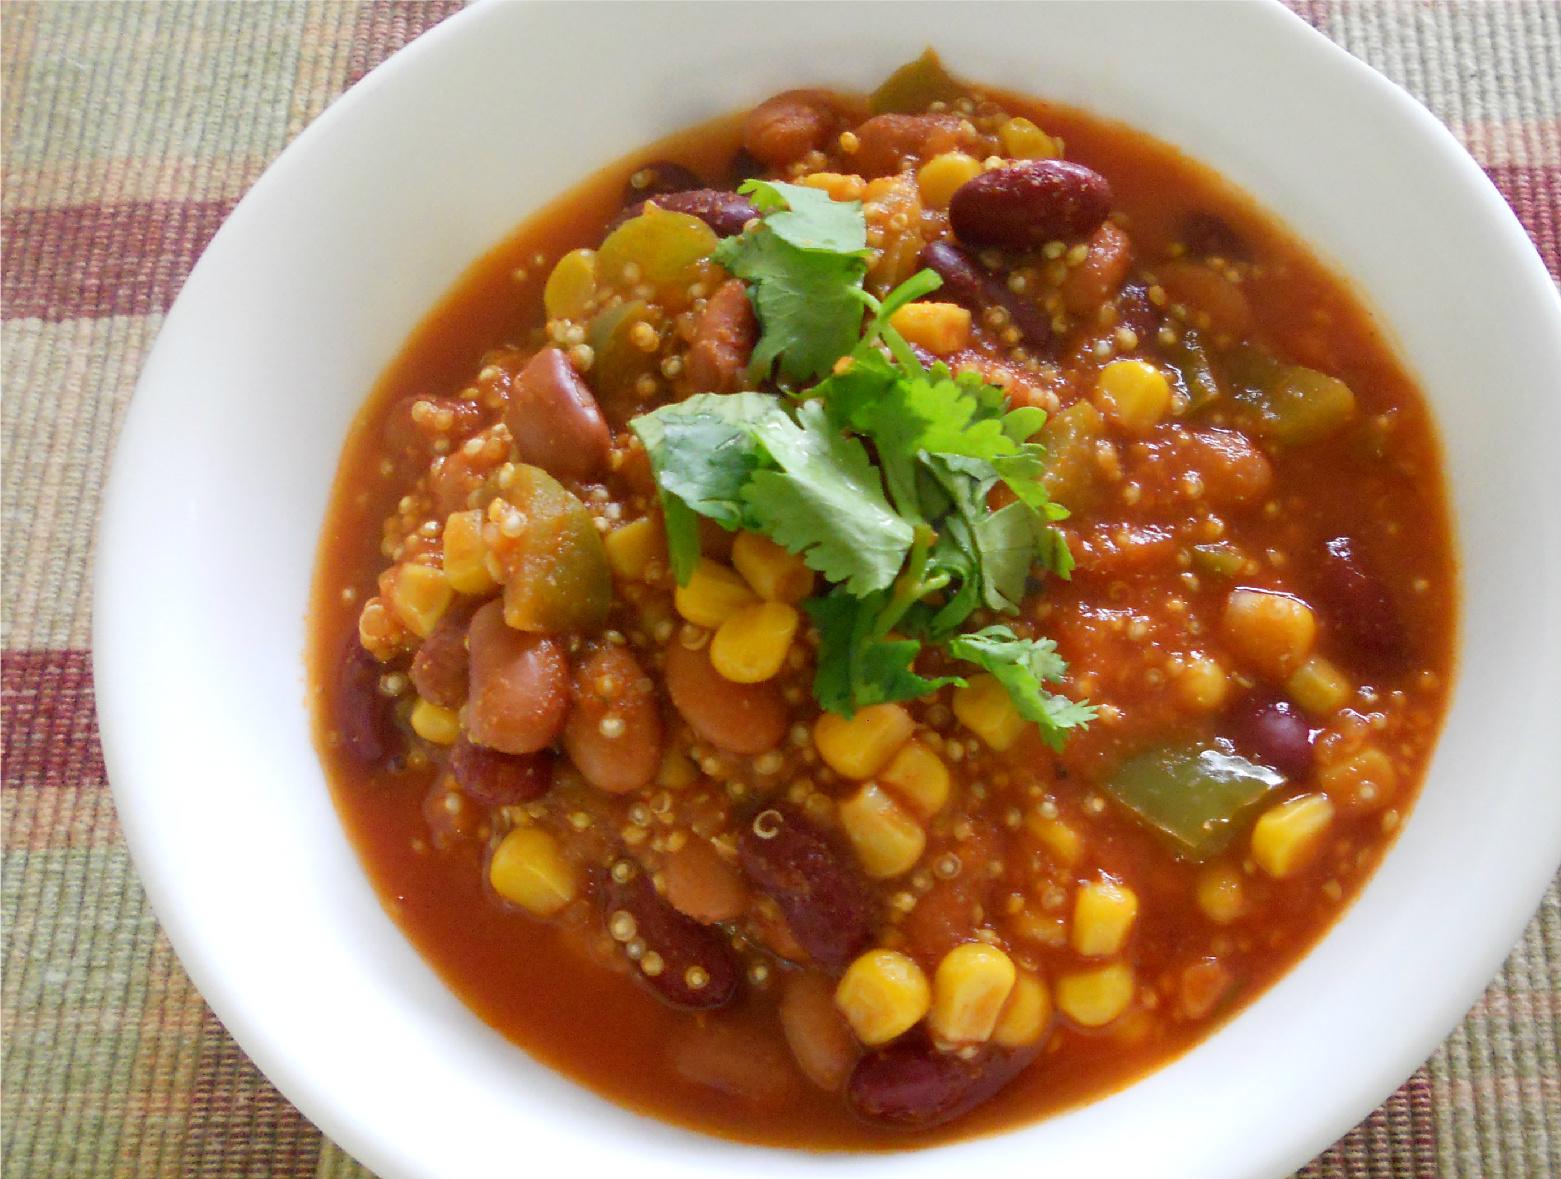 The Skimpy Pantry: Simple Quinoa Chili